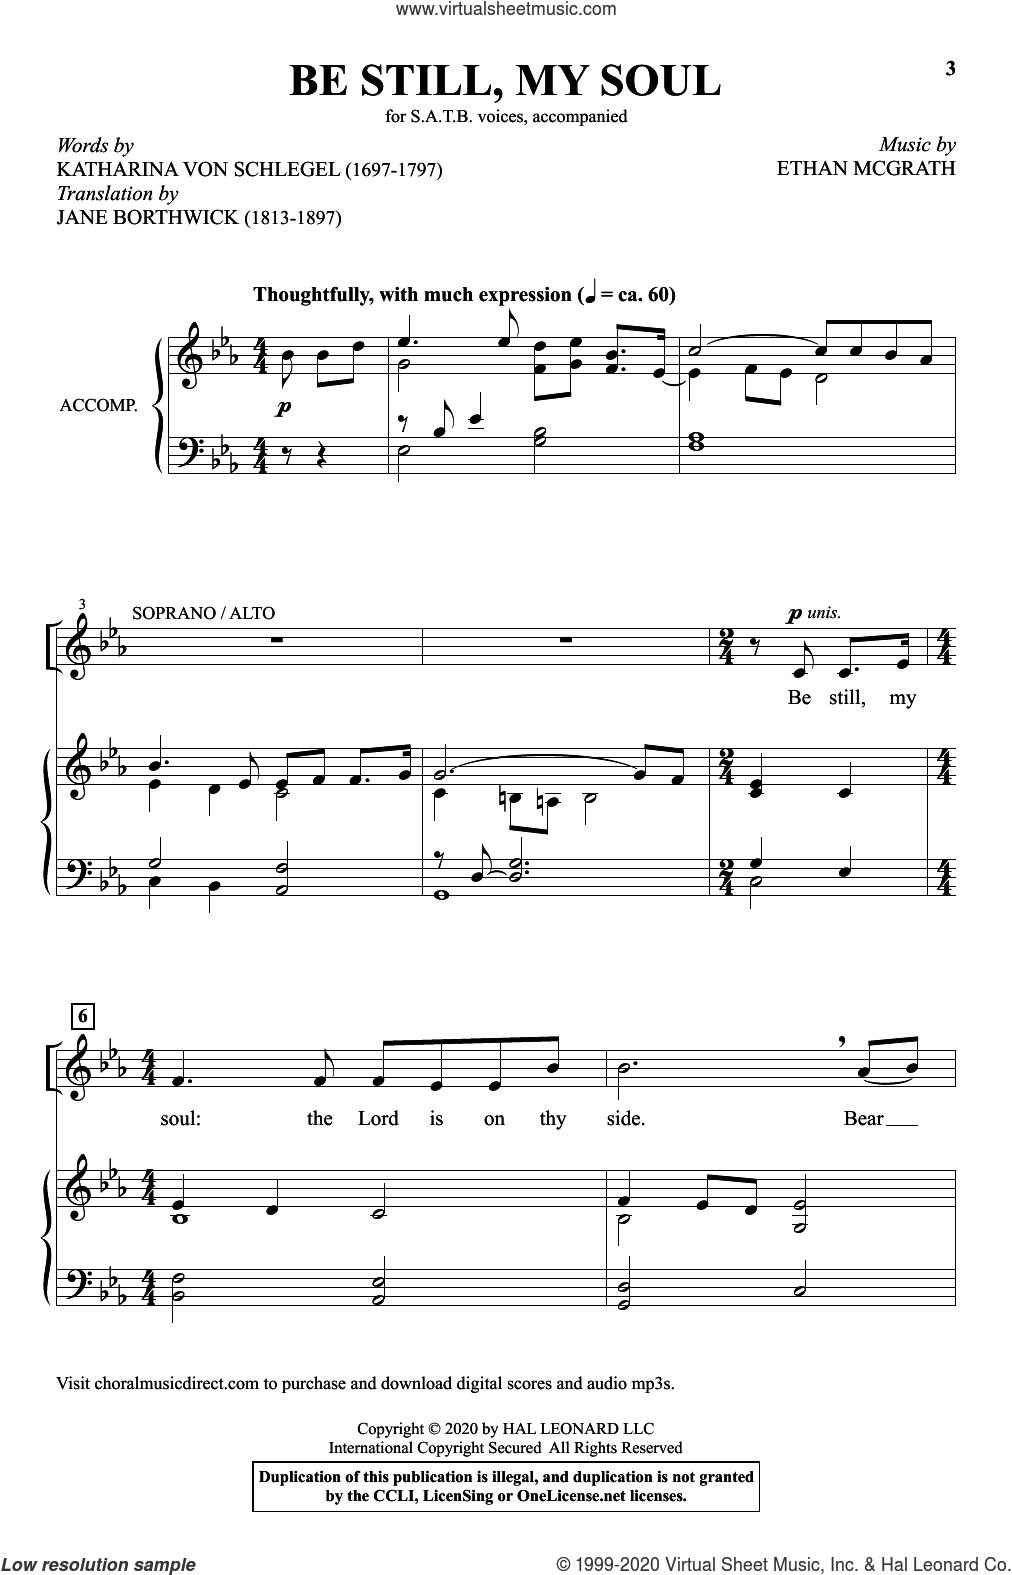 Be Still, My Soul sheet music for choir (SATB: soprano, alto, tenor, bass) by Ethan McGrath, Katharina von Schlegel and Katharina Von Schlegel and Ethan McGrath, intermediate skill level